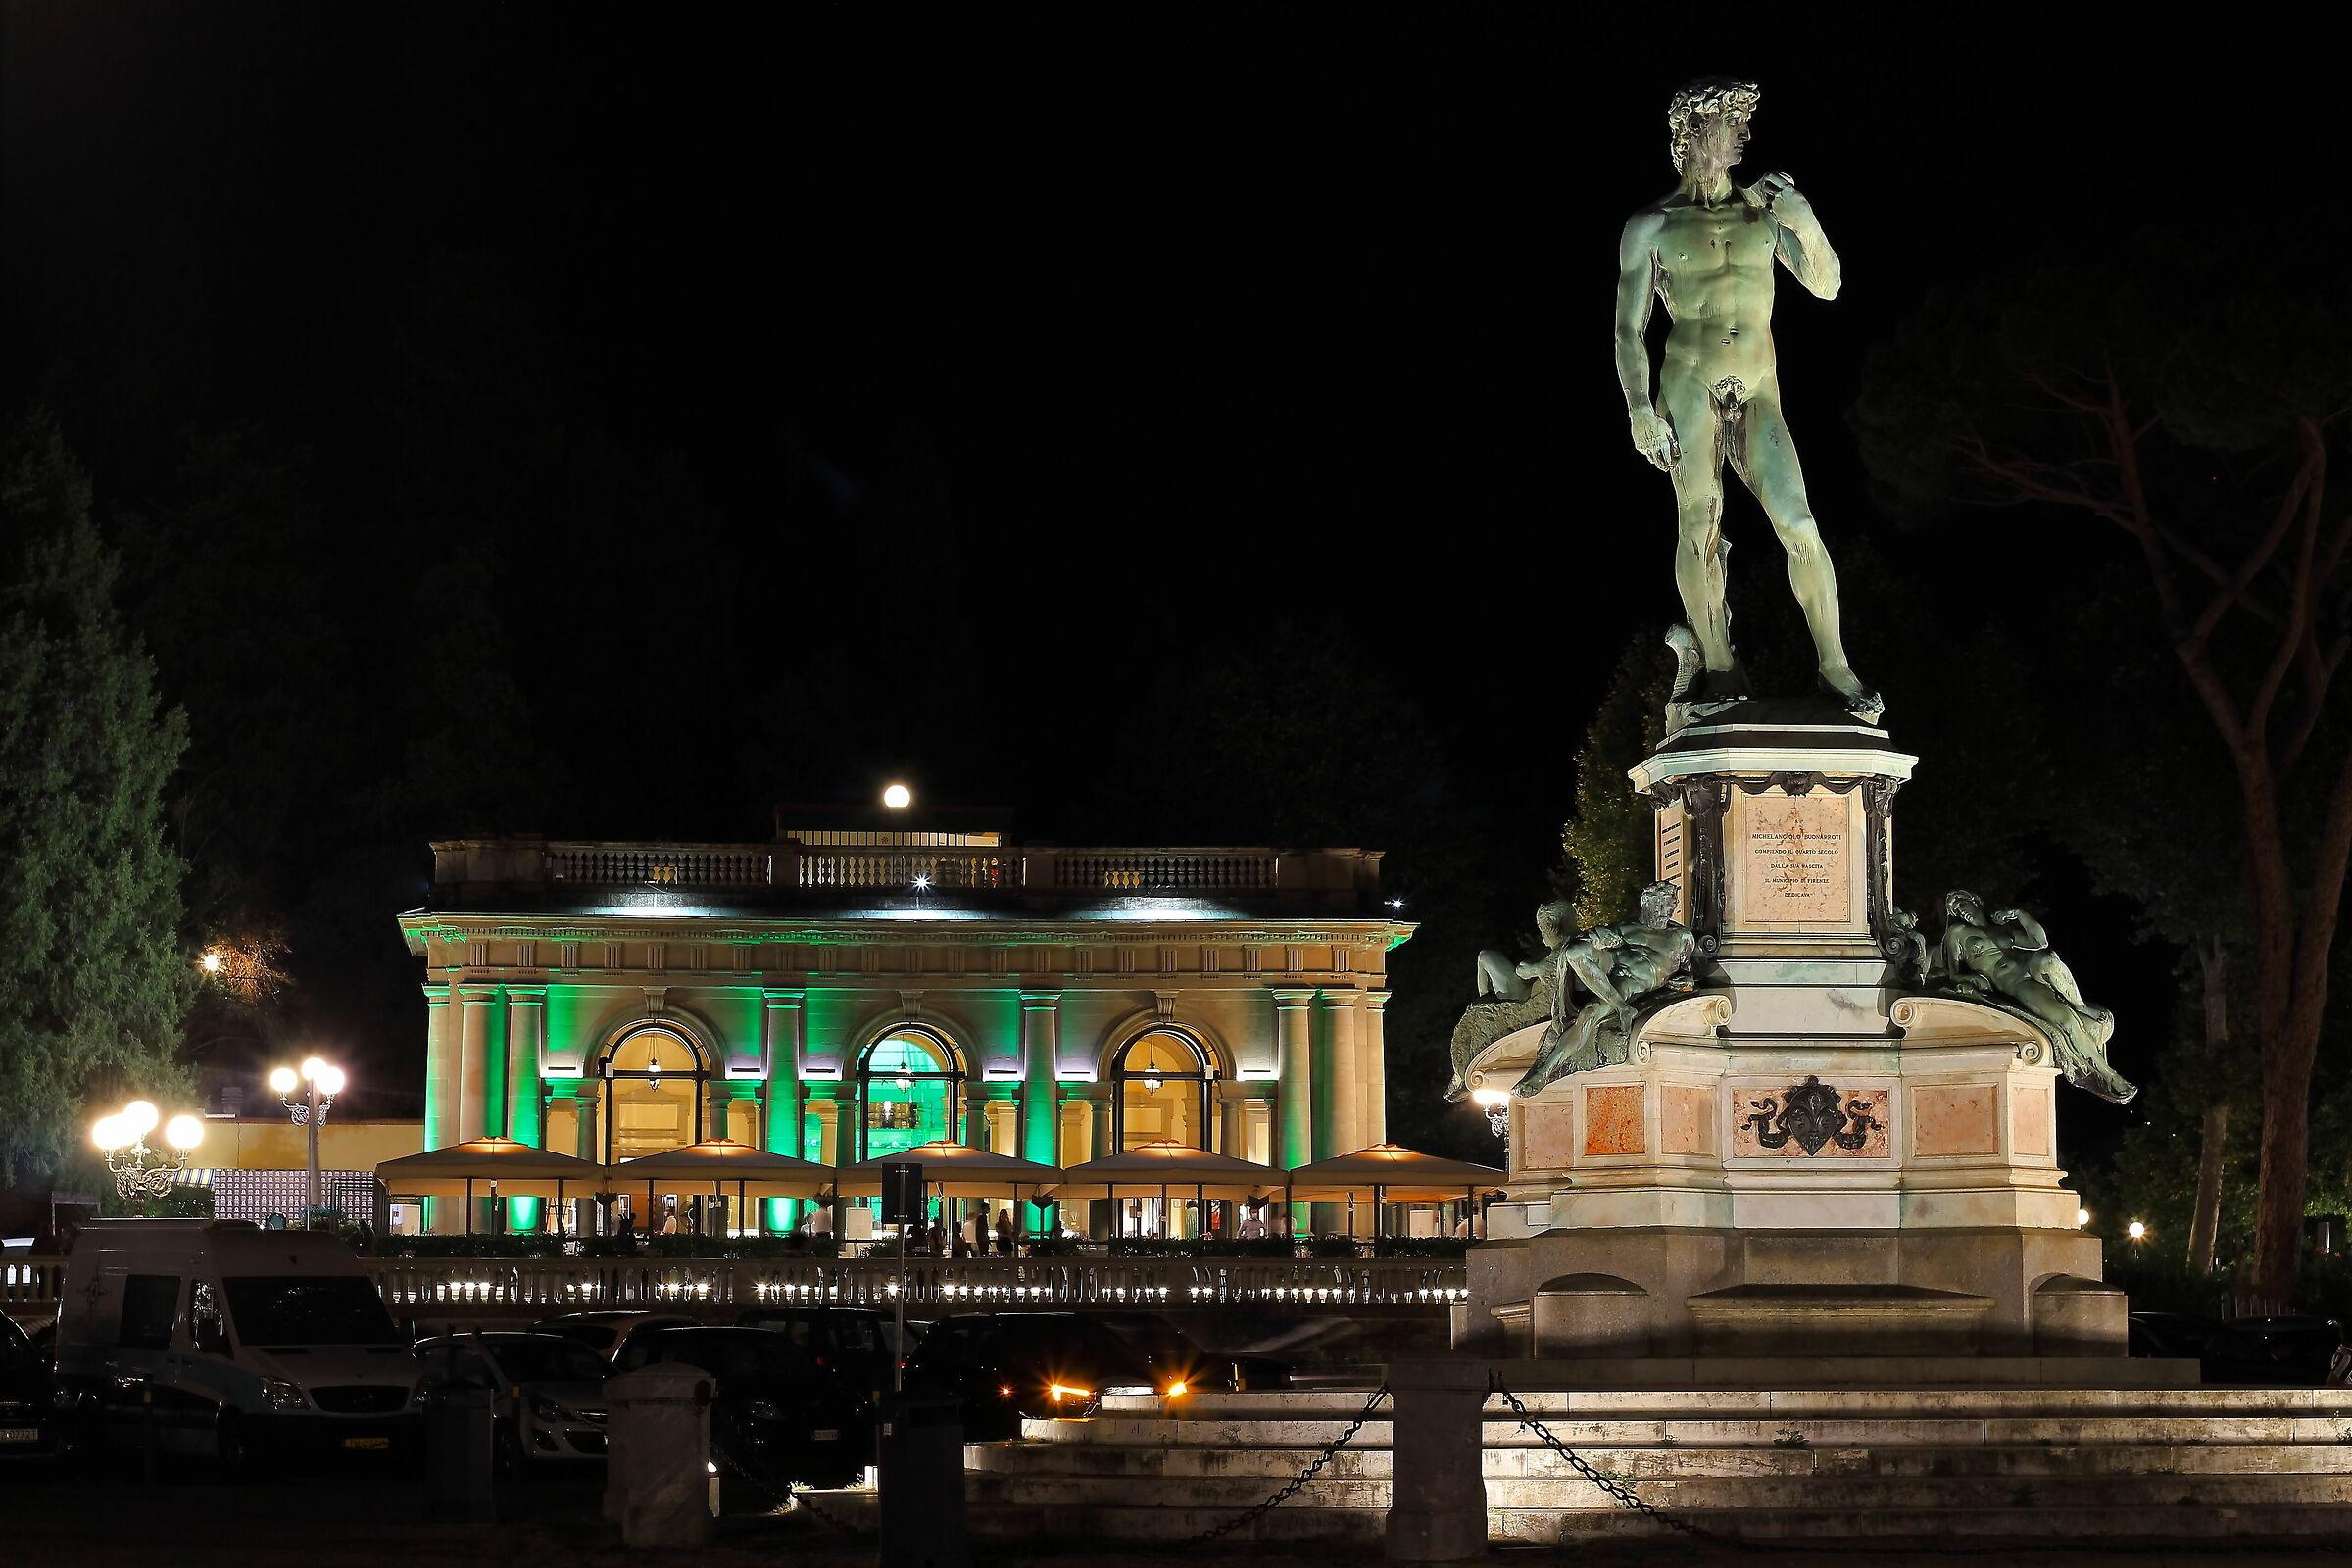 The David of (square) Michelangelo...